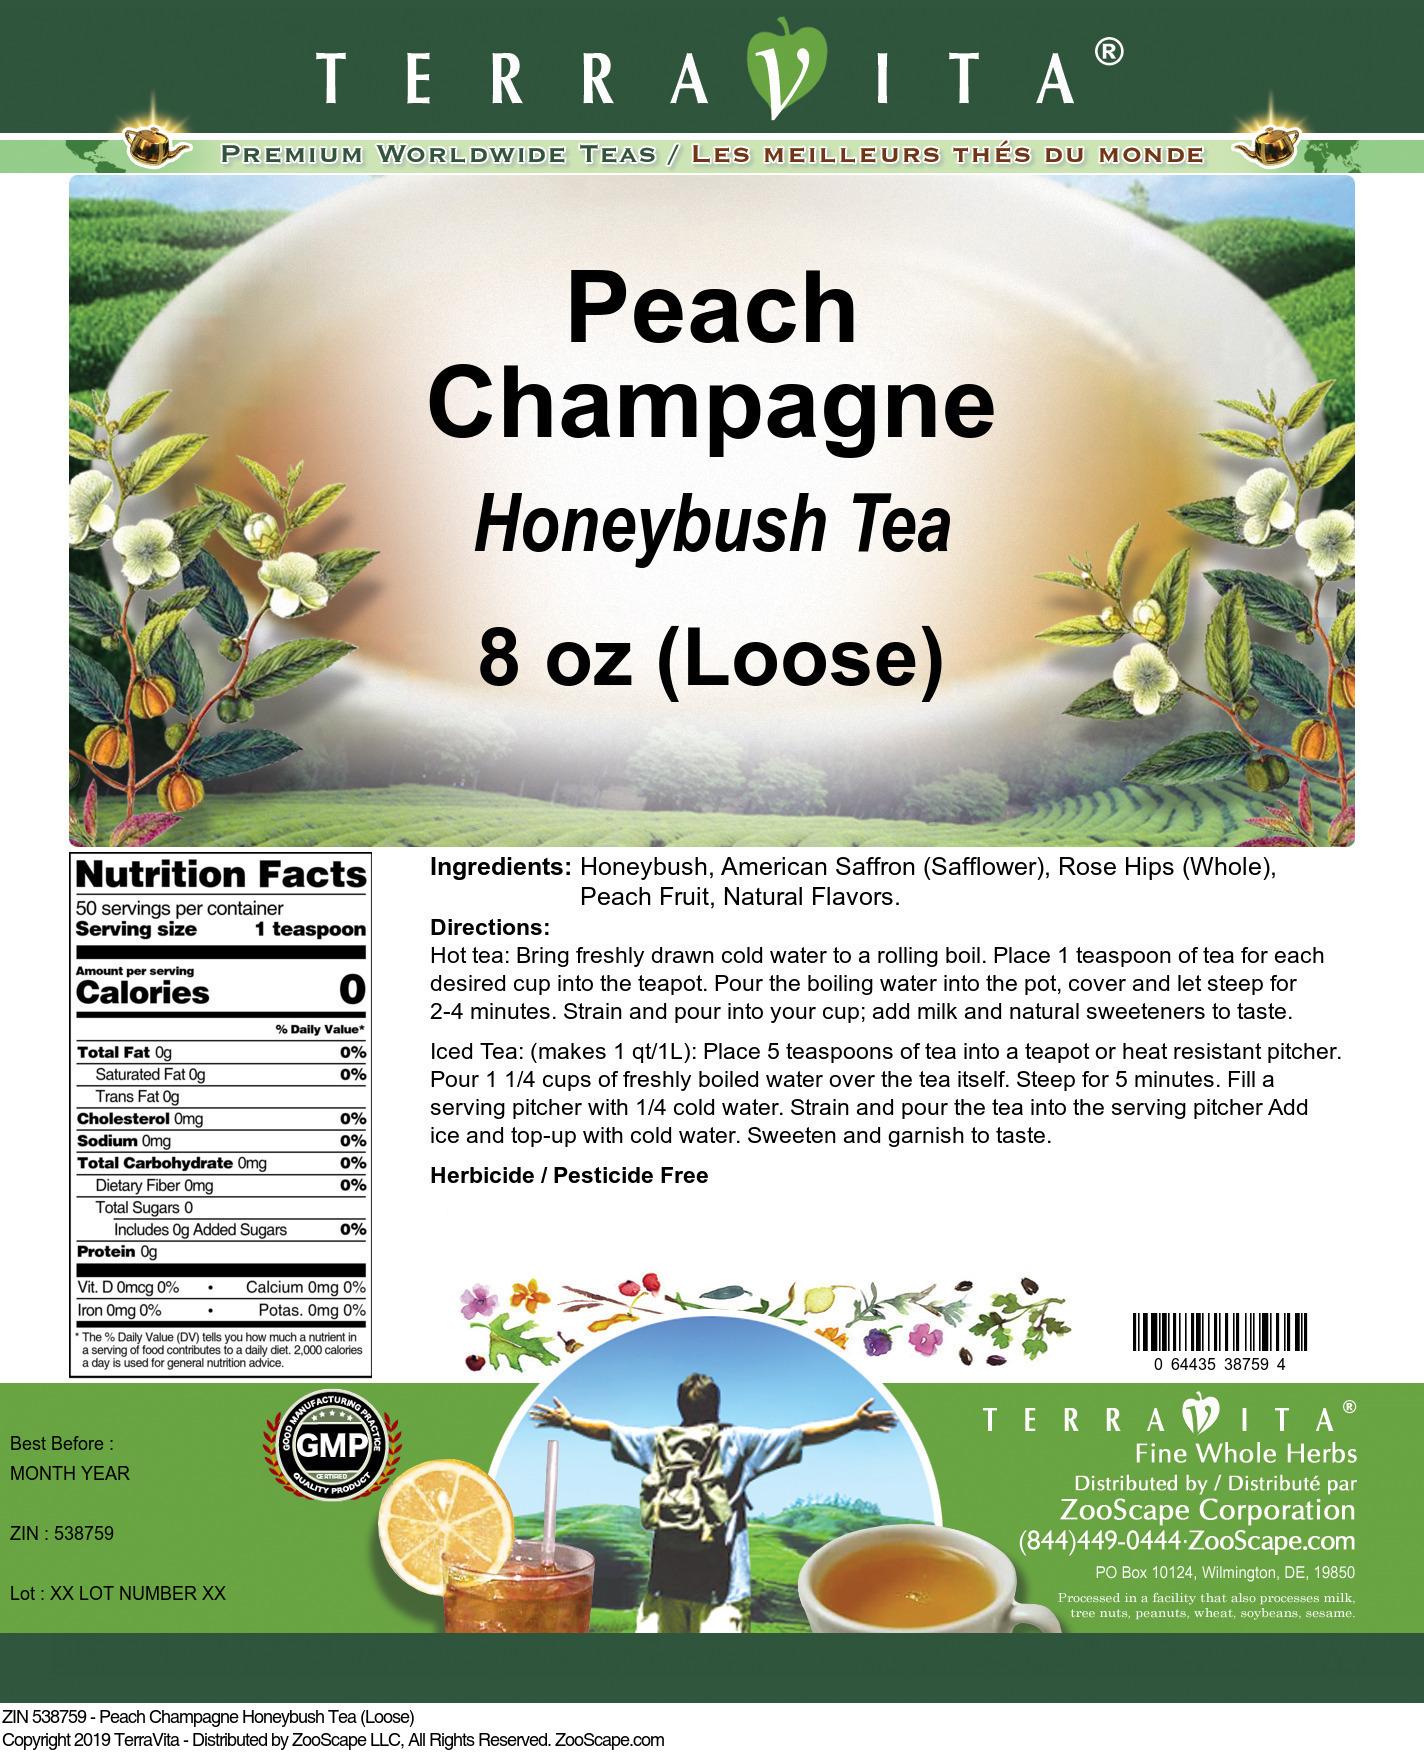 Peach Champagne Honeybush Tea (Loose)